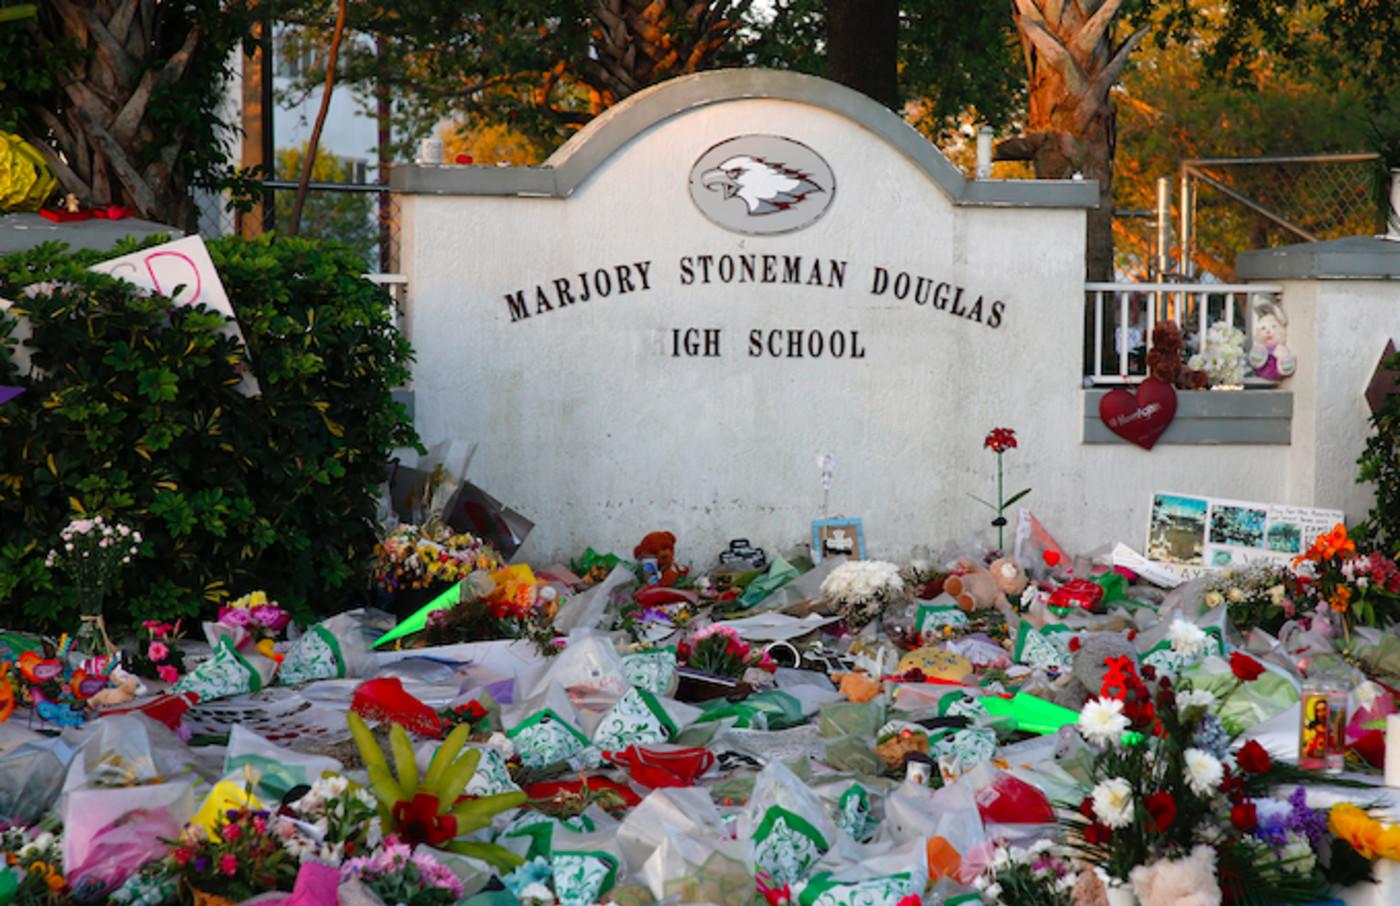 Marjory Stoneman Douglas High